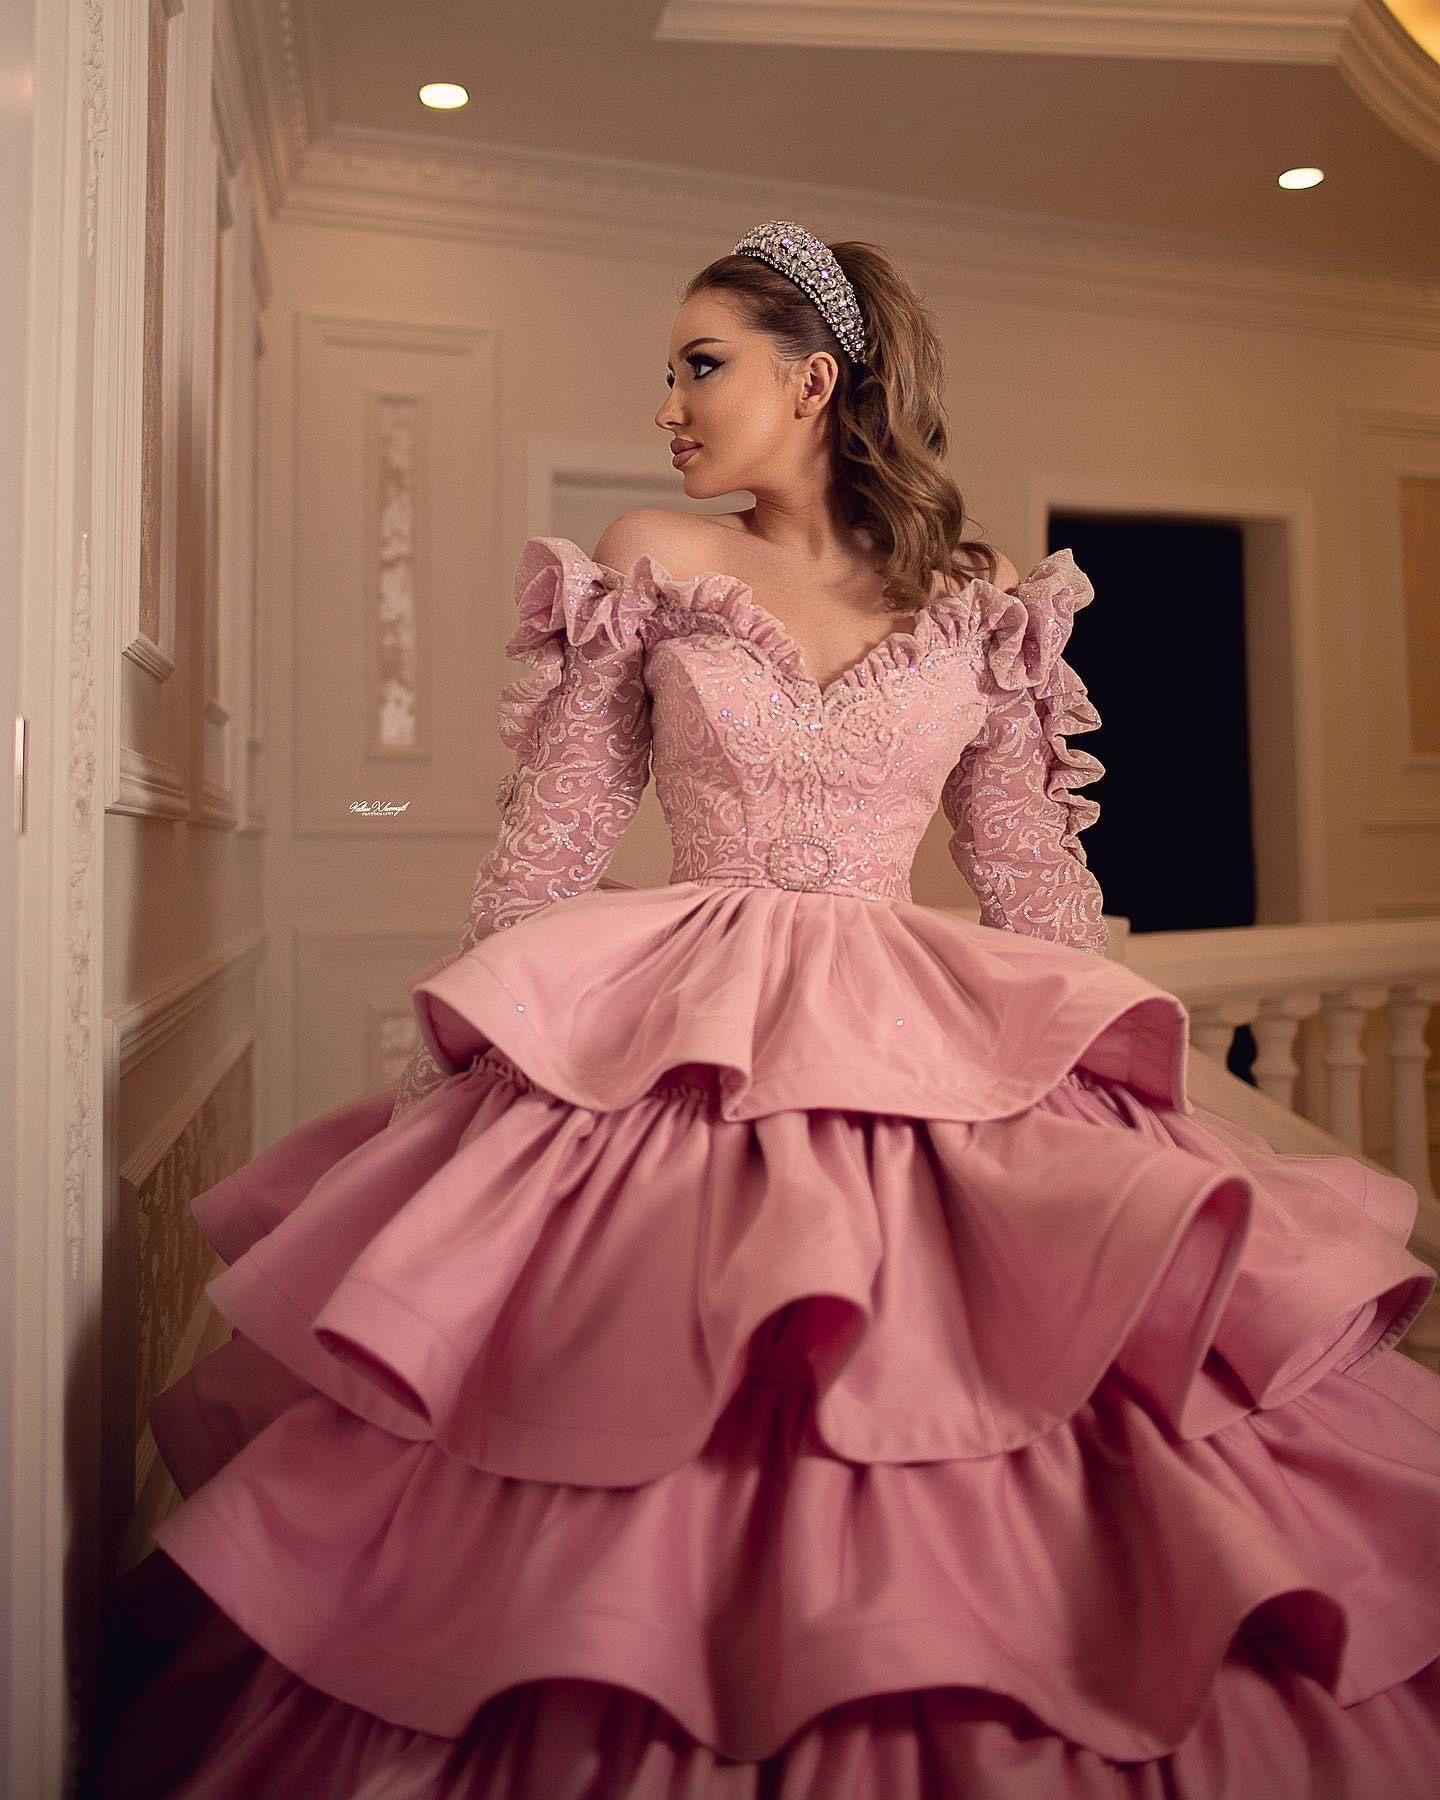 Pin By Paloma Barragan On Pink Victorian Dress Fashion Dresses [ 1800 x 1440 Pixel ]